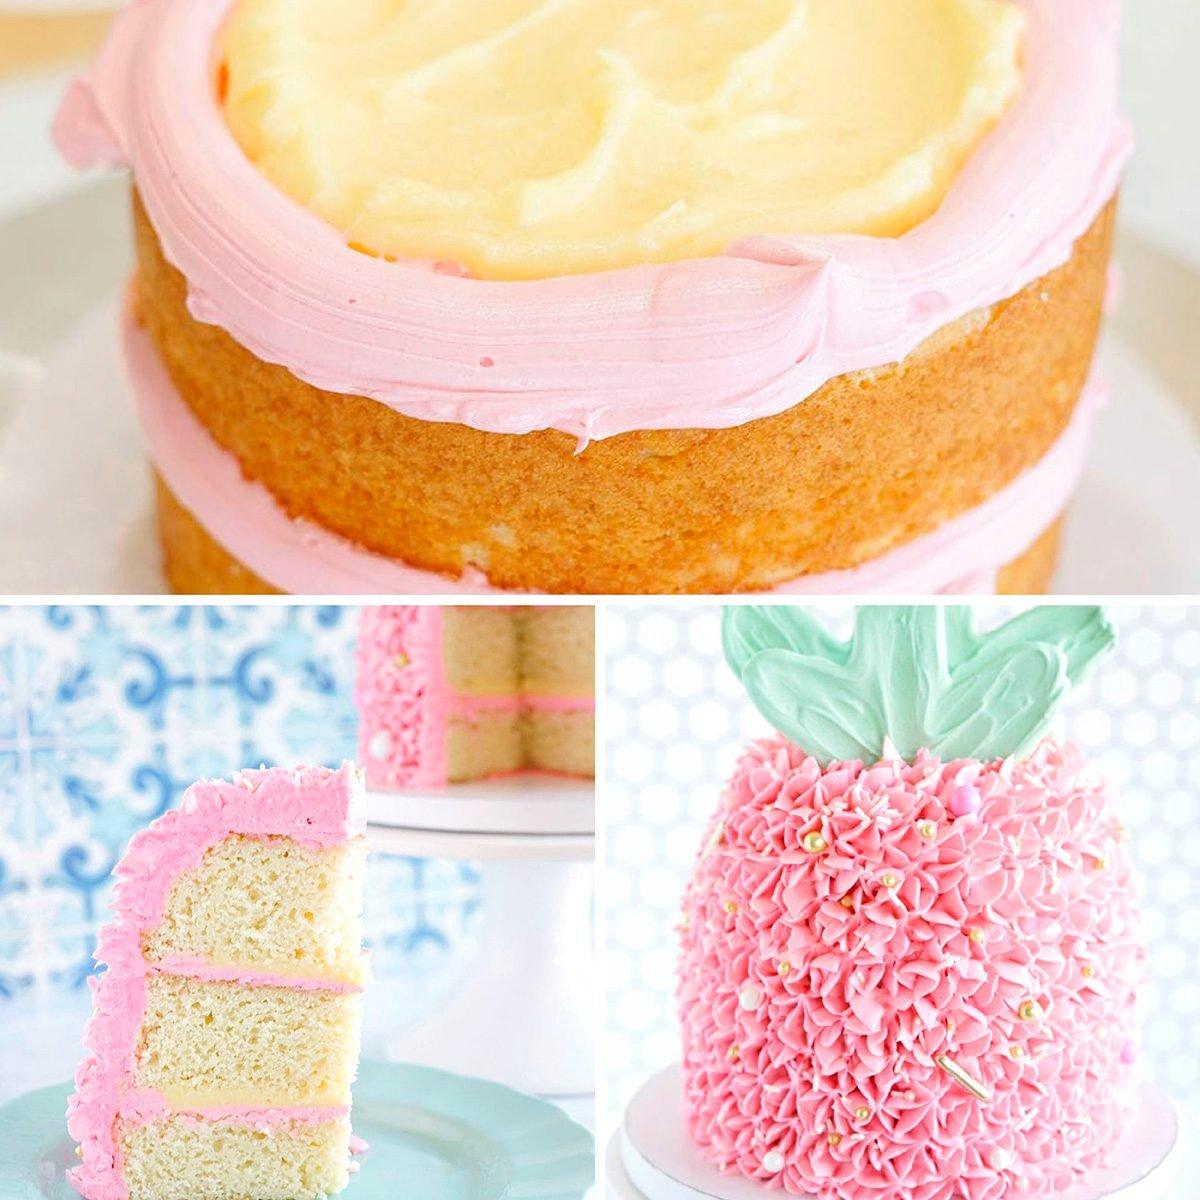 Pineapple cake decorating ideas